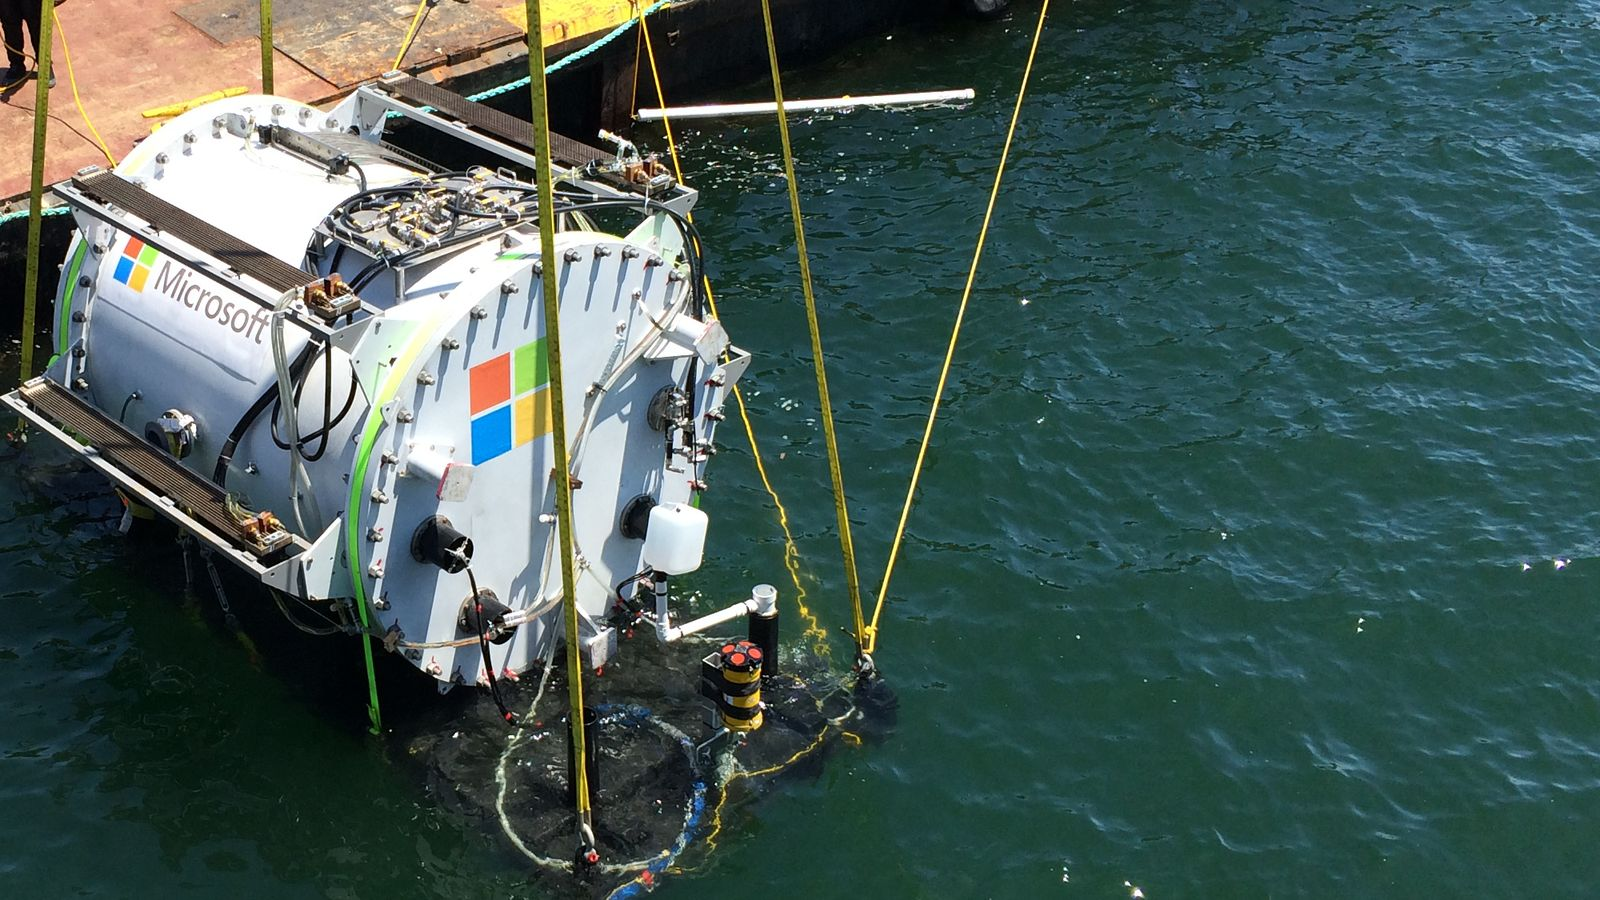 Дата-центр Microsoft из Шайенна переходит на энергию ветра - 2